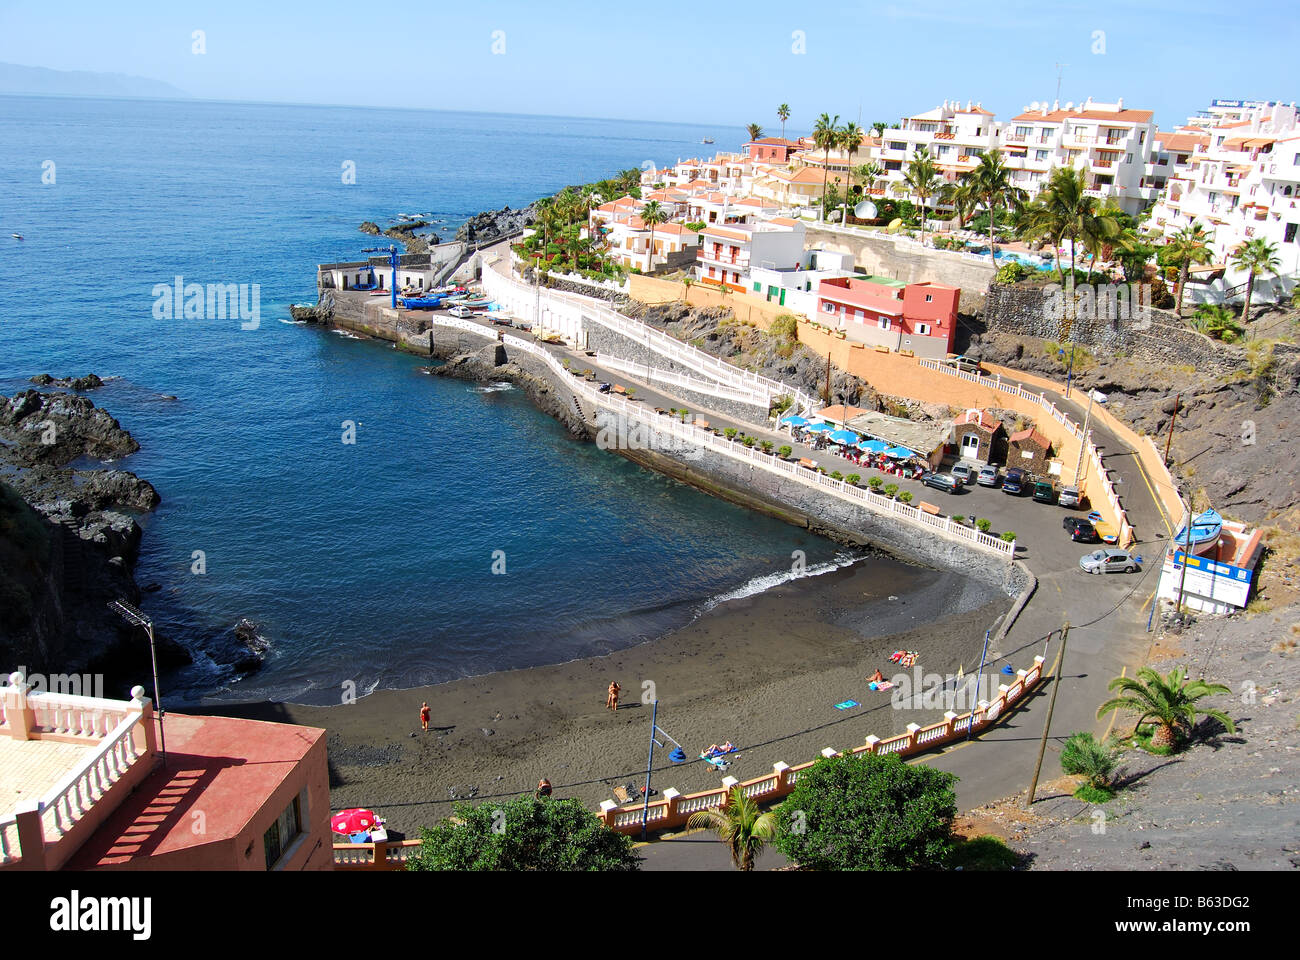 Beach view puerto de santiago tenerife canary islands spain stock photo royalty free image - Puerto santiago tenerife mapa ...